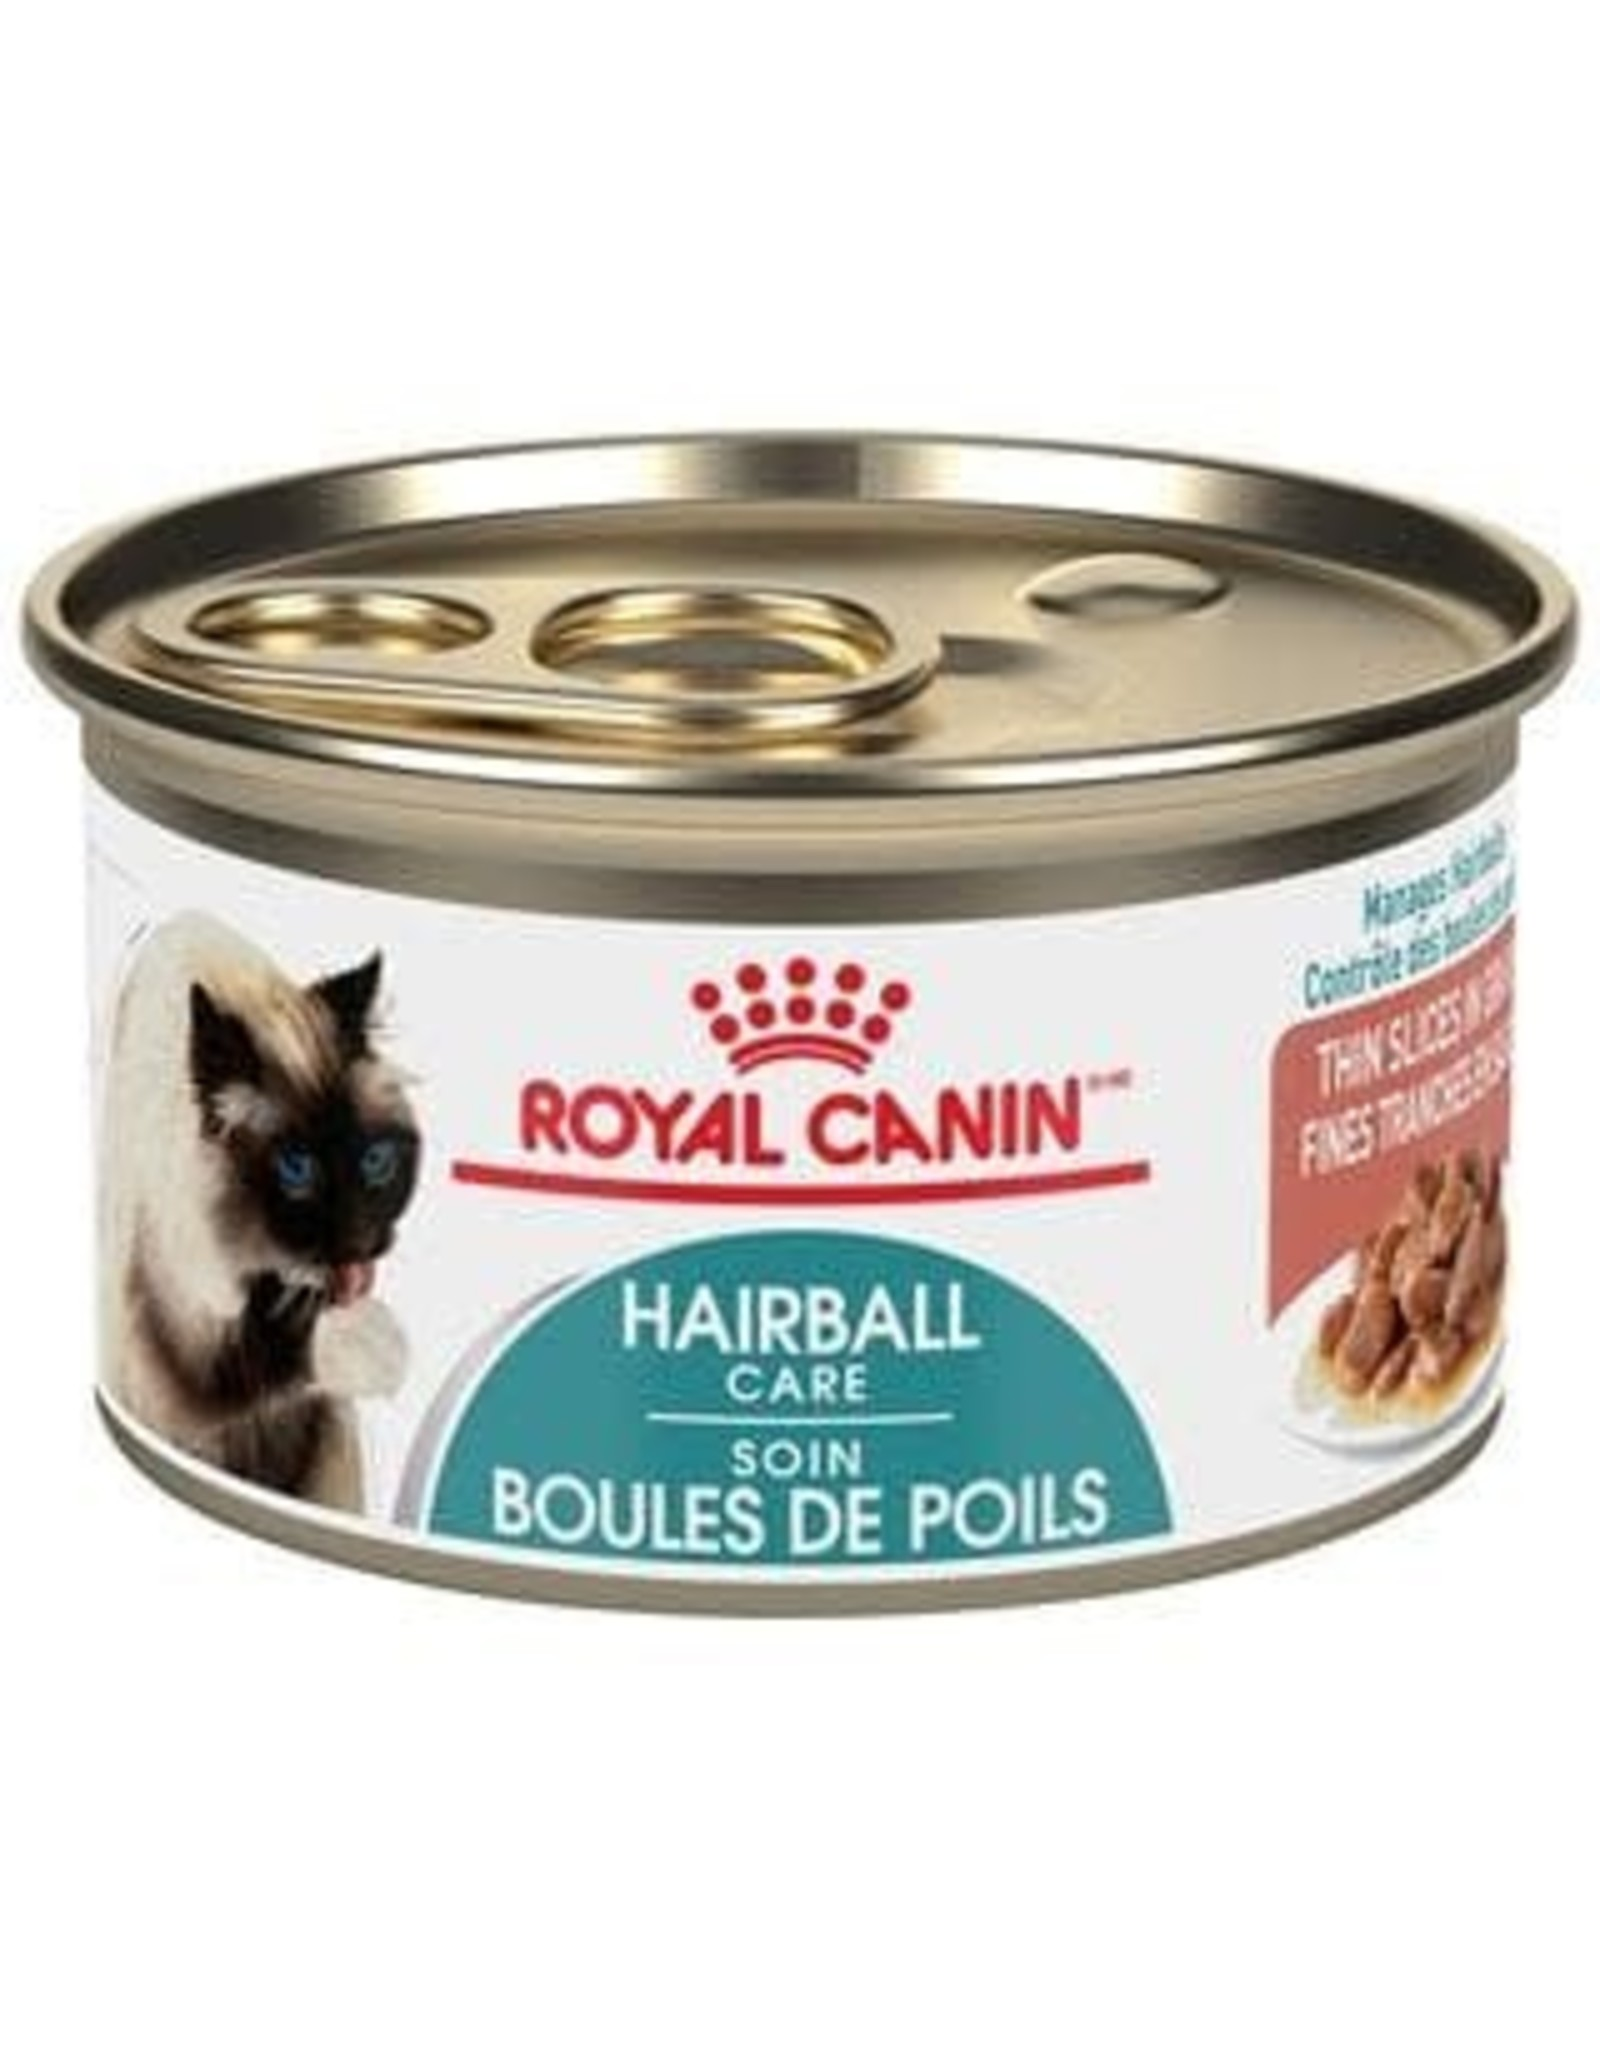 Royal Canin Royal Canin Cat - Hairball thin slices in gravy 3oz